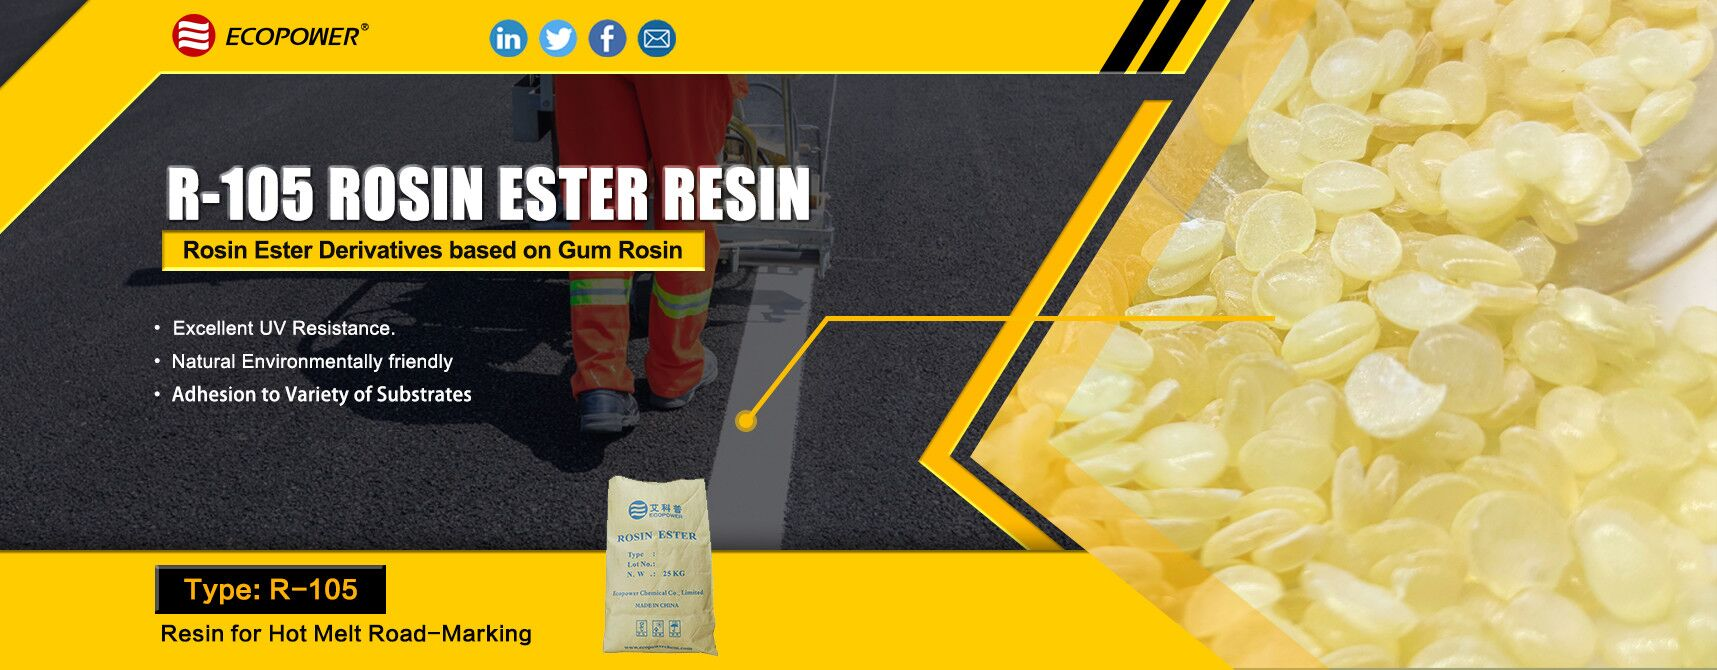 R-105 ROSIN ESTER RESIN